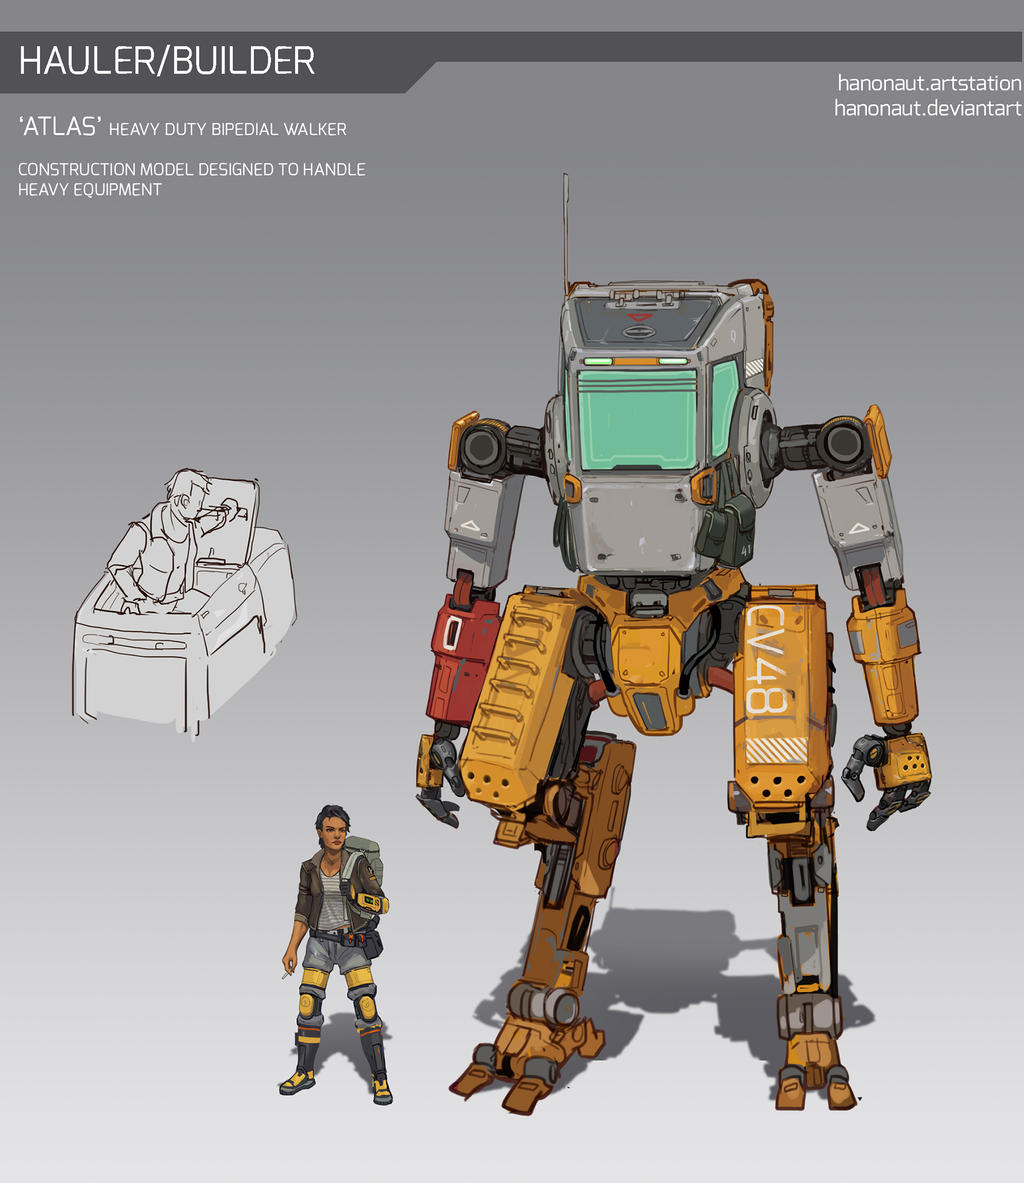 ATLAS Construction Mech by Hanonaut